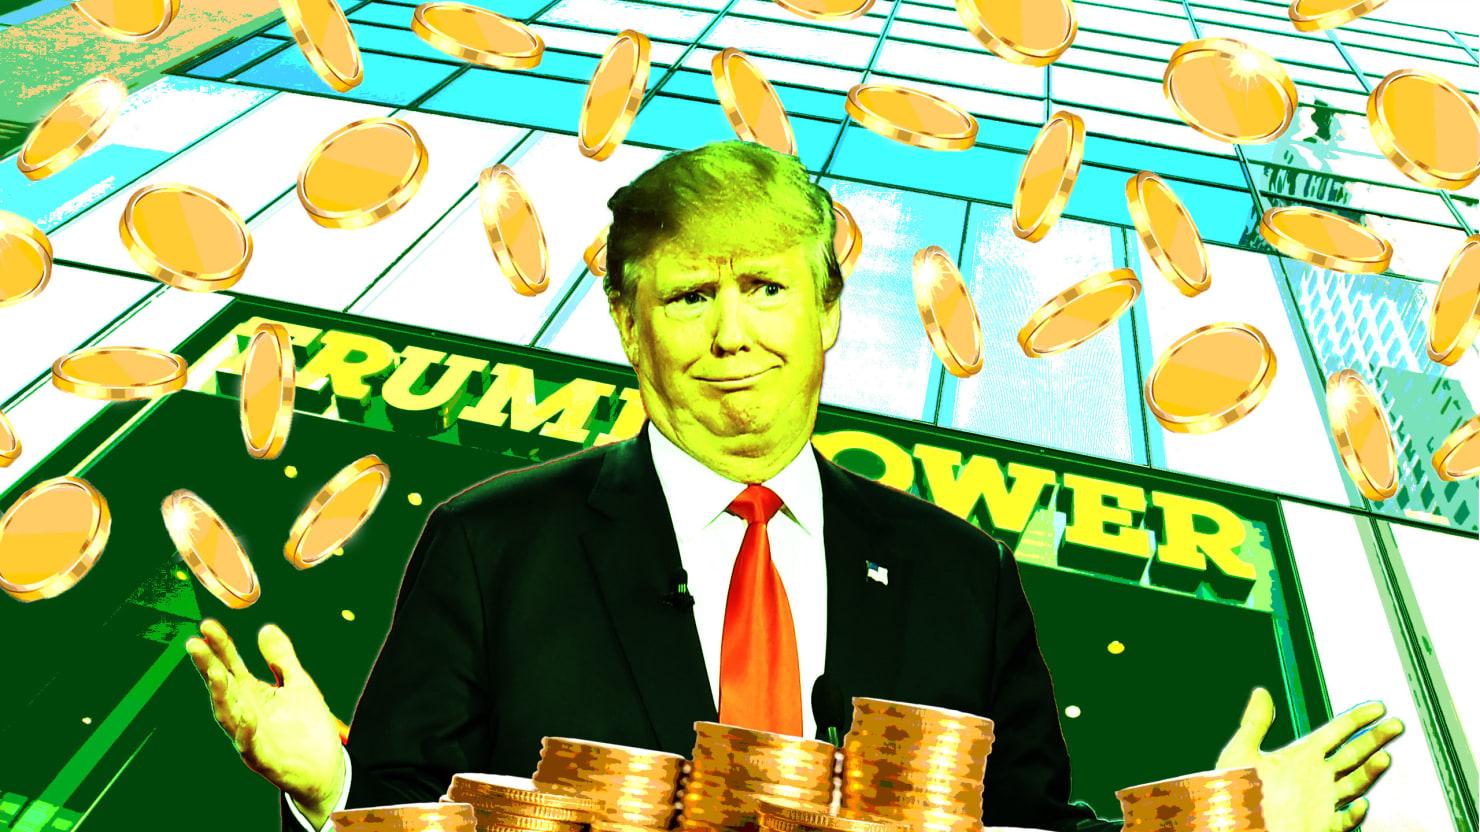 Donald Trump's Campaign Paid $11 Million to Trump Businesses